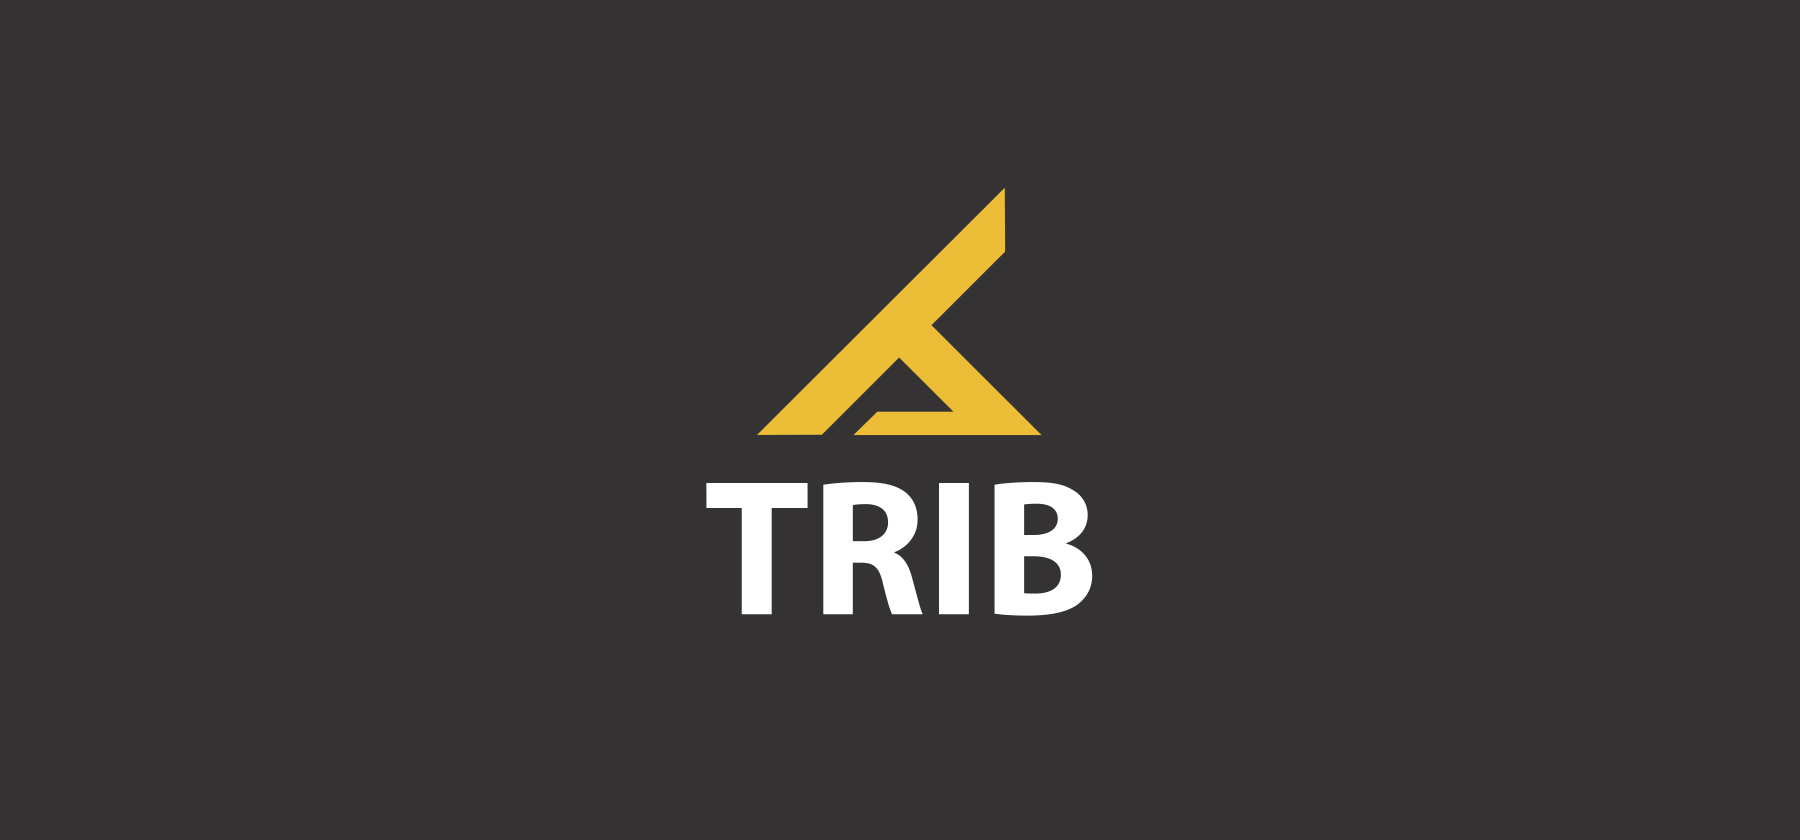 trib-logo-ontwerp